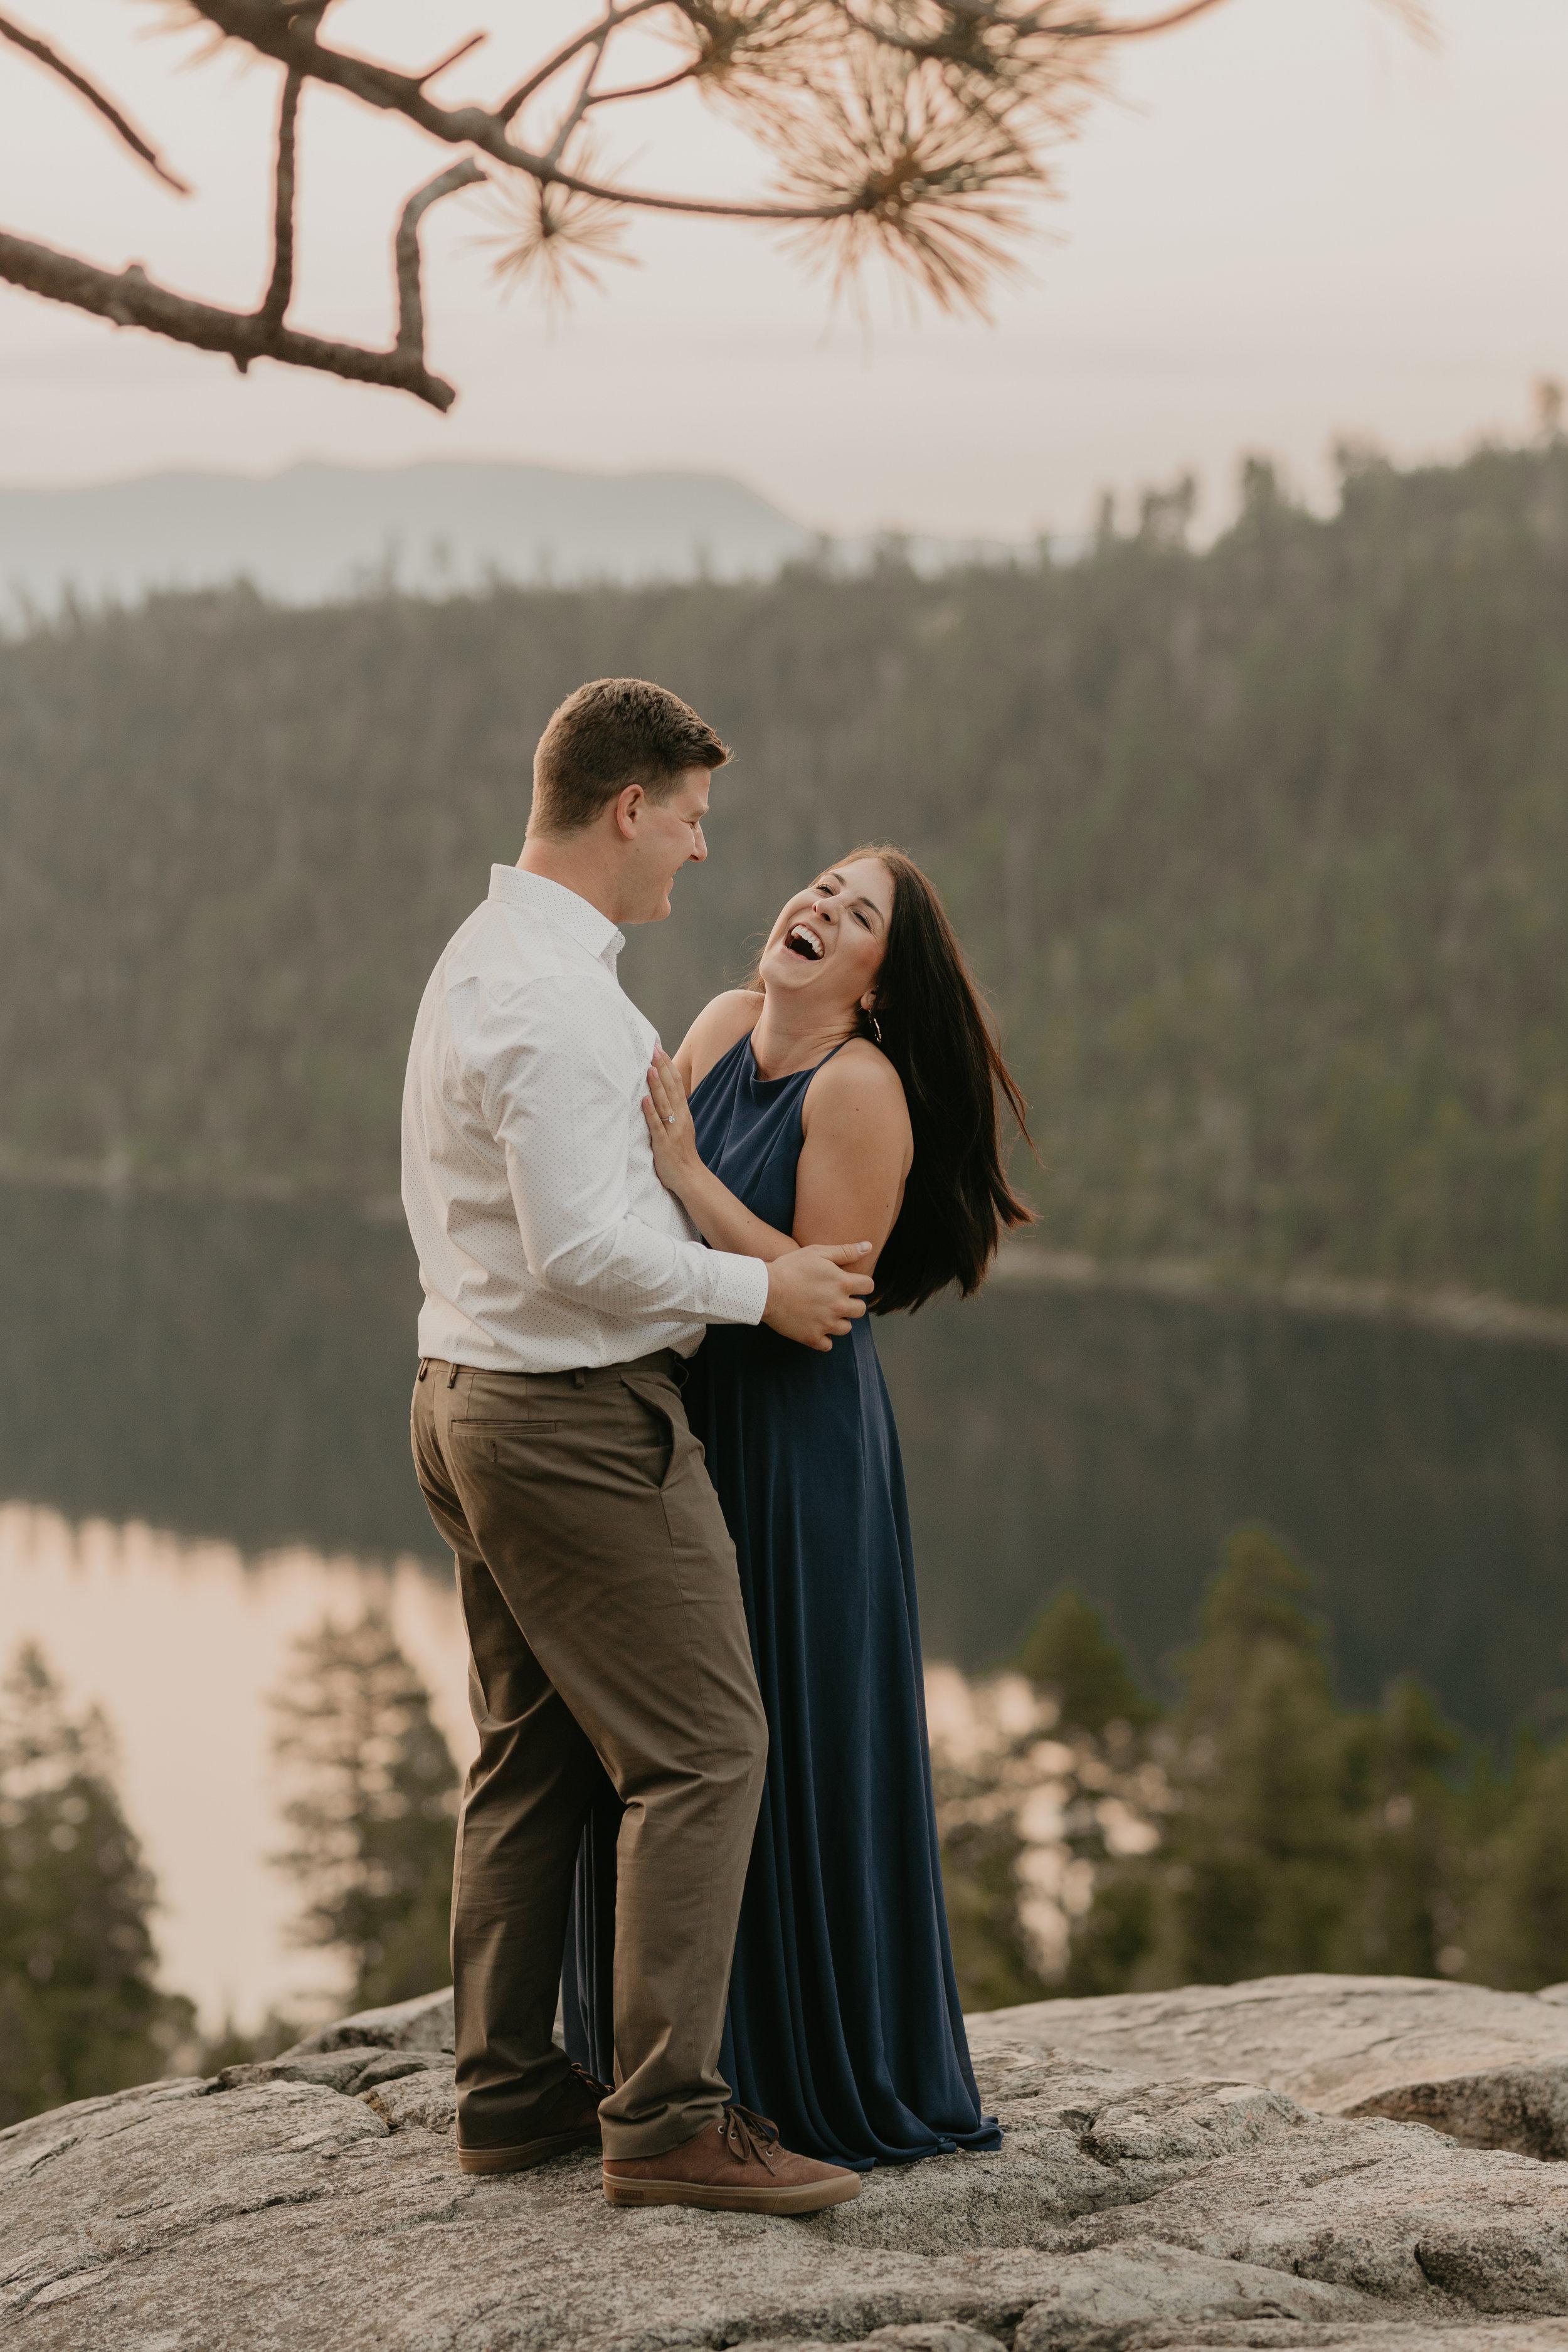 nicole-daacke-photography-lake-tahoe-sunrise-summer-adventure-engagement-photos-nevada-wedding-elopement-photographer-golden-emerald-bay-light-pine-trees-summer-vibe-fun-carefree-authentic-love-6.jpg